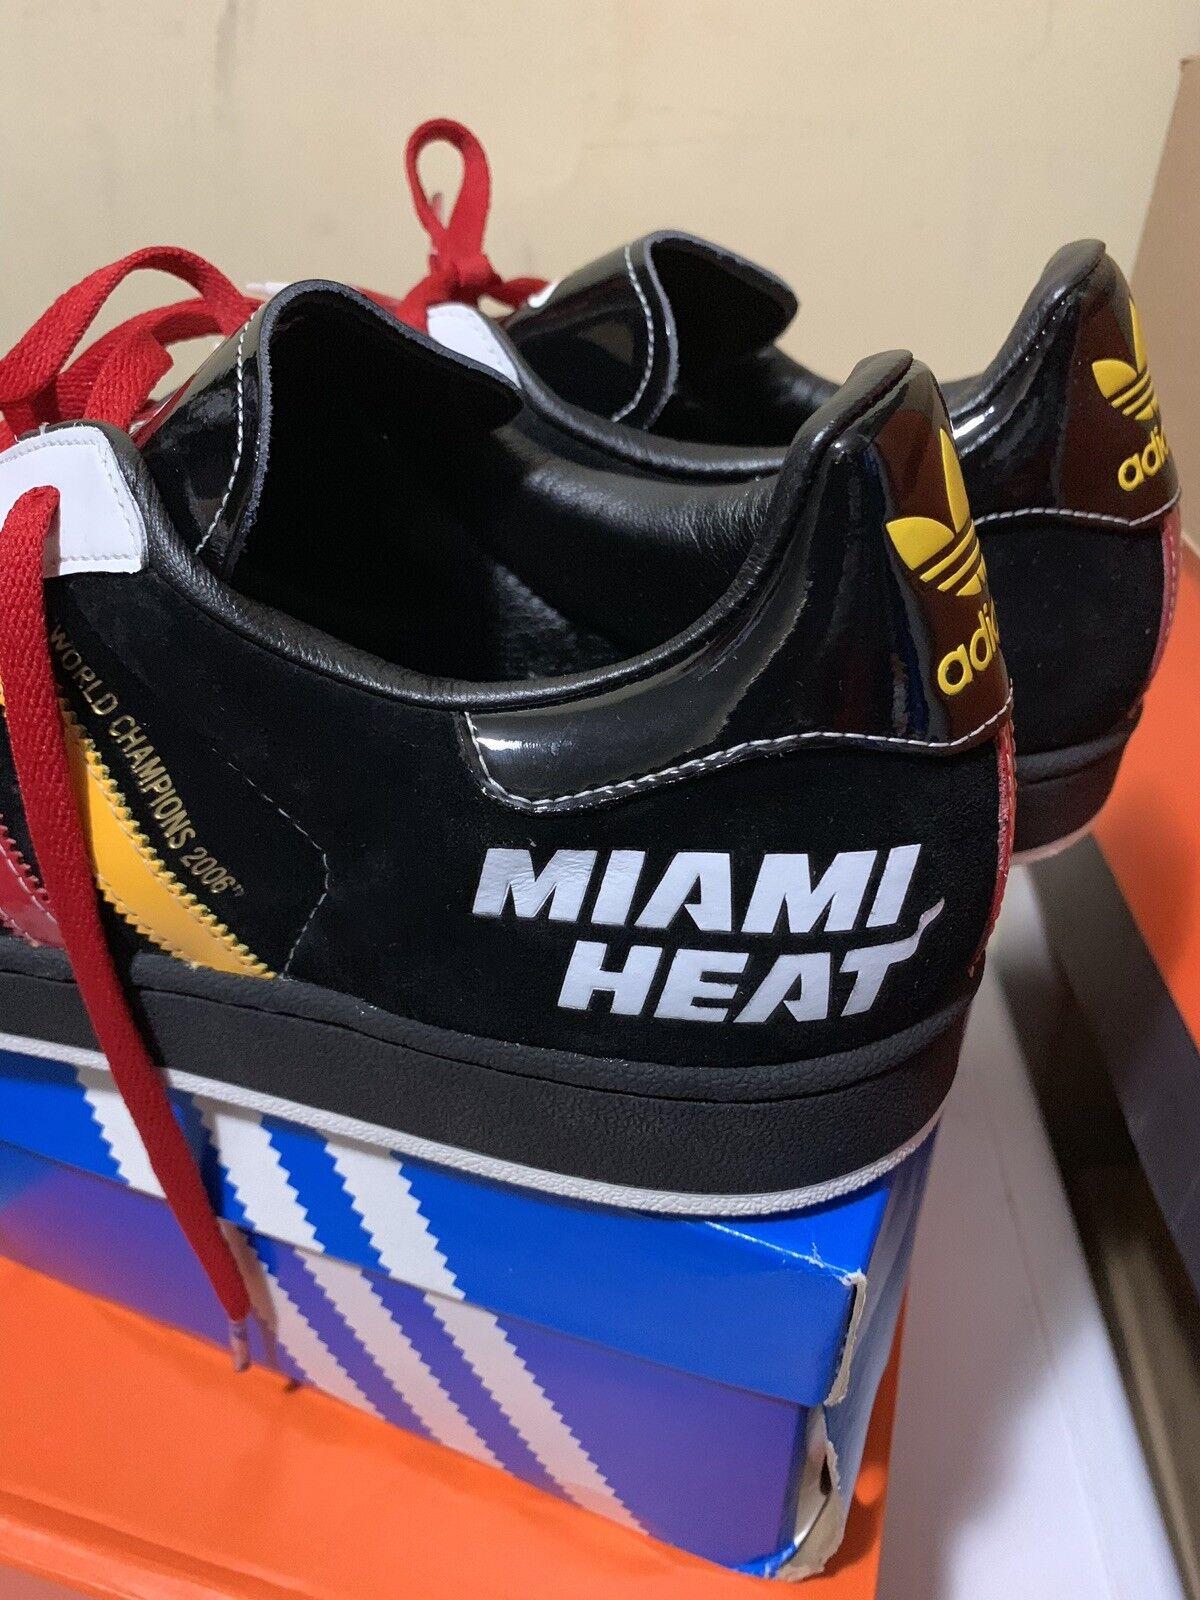 Adidas Superstar  017136 1 017136  Miami Heat 2006 Championship Edition Mens Size 12 58b791